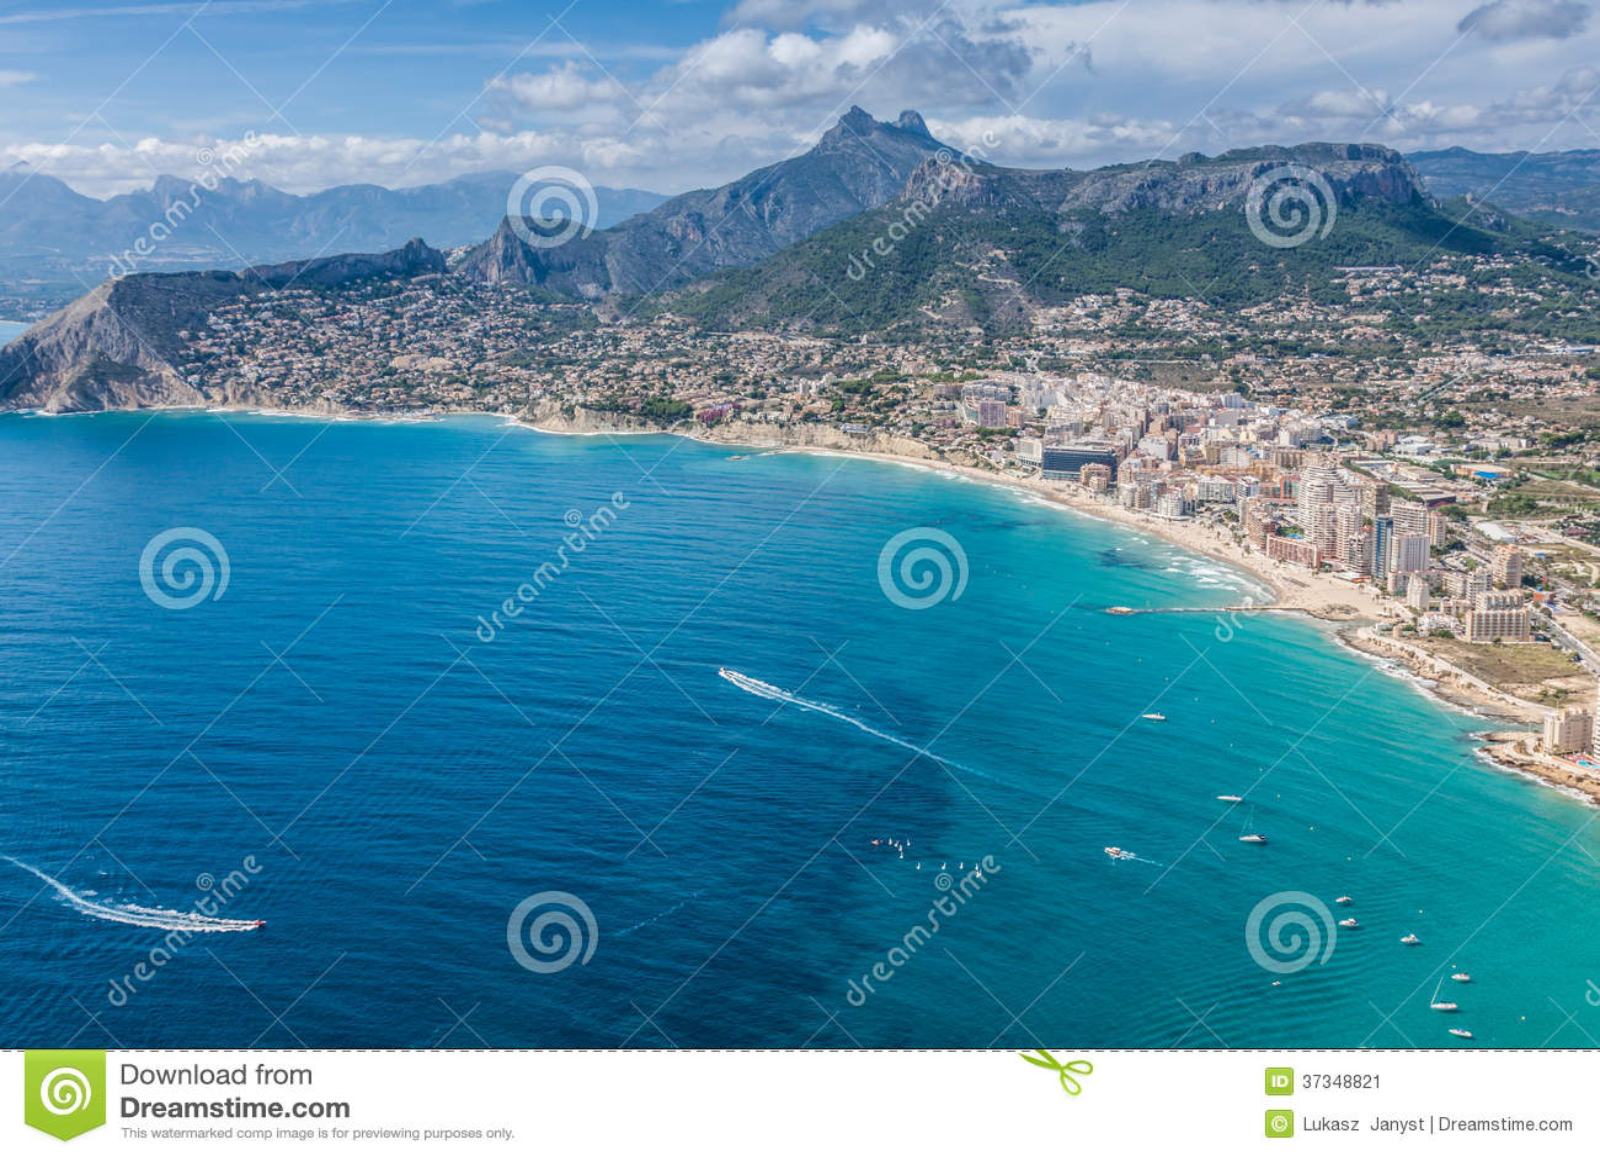 Kustlinje av den medelhavs- semesterorten Calpe, Spanien med havet och sjön